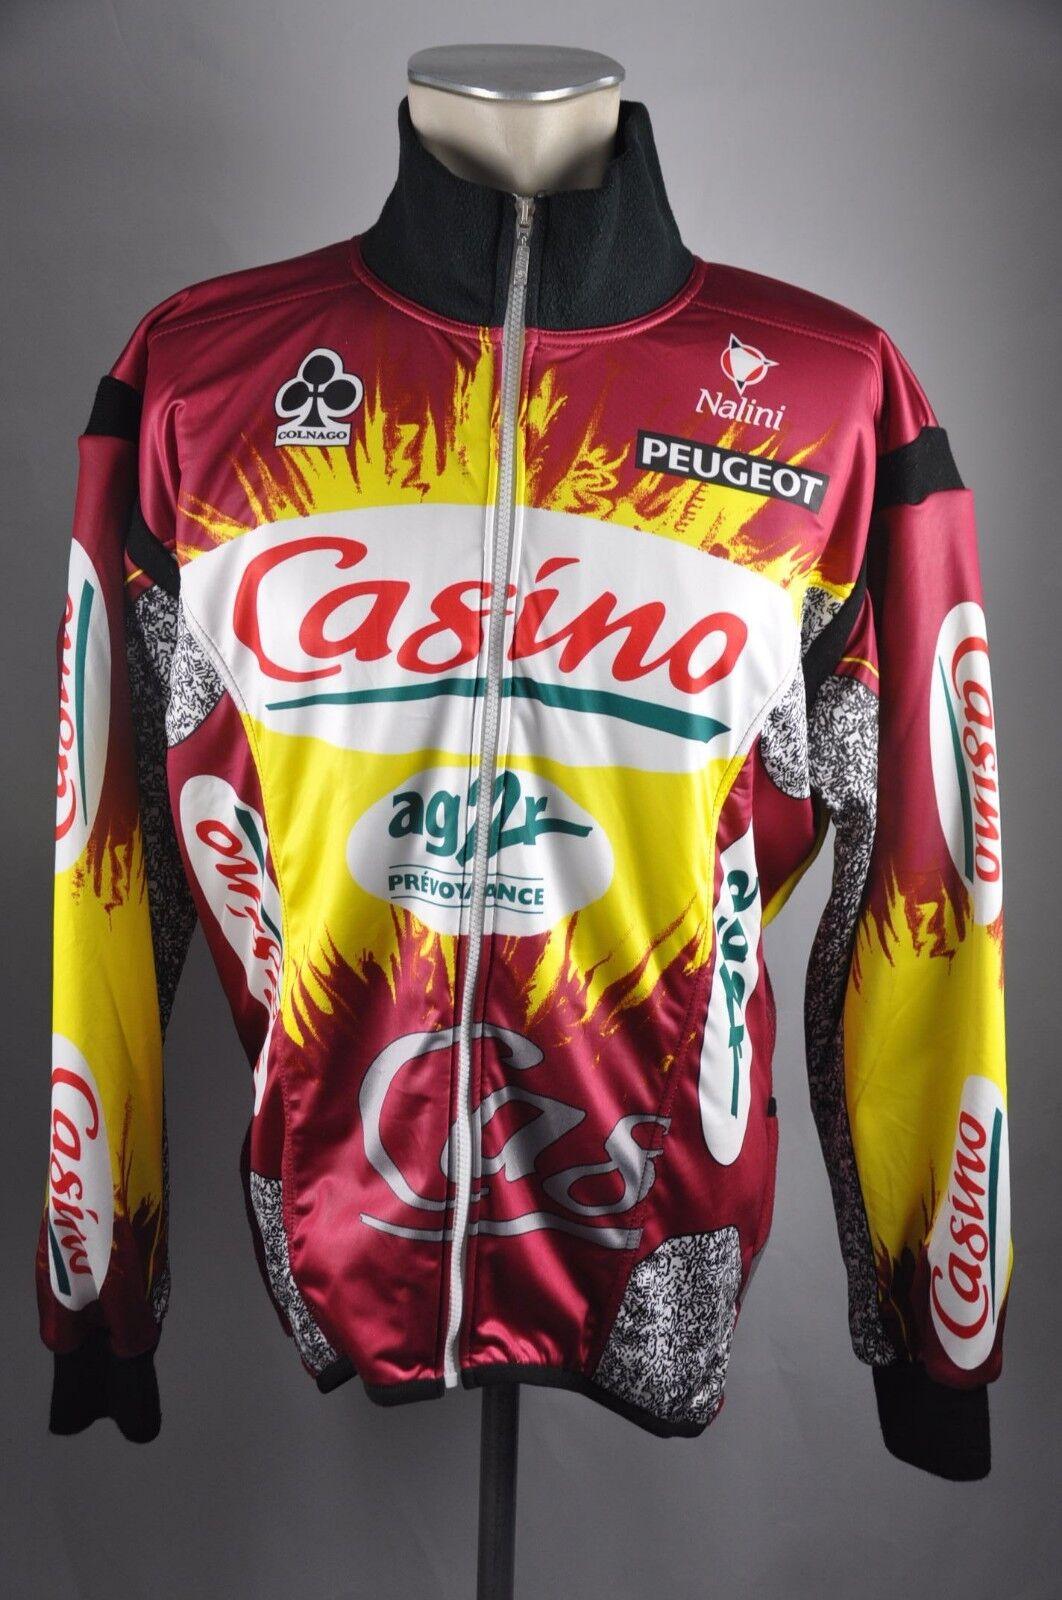 Nalini casino ag2r vintage rueda chaqueta  talla 6 L-XL BW 66cm bike Cycling bc1  Con precio barato para obtener la mejor marca.